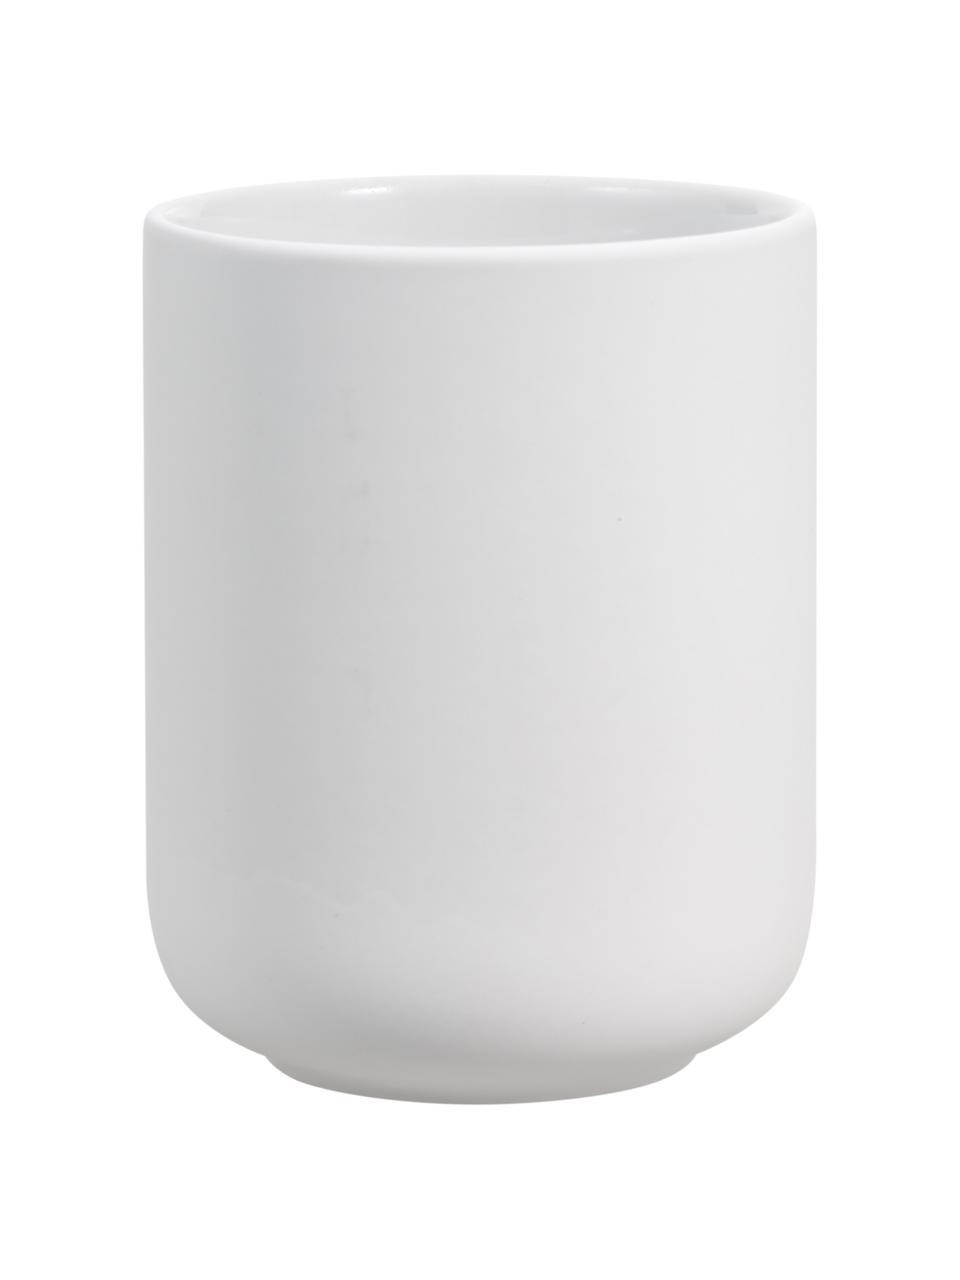 Tandenborstelbeker Ume van keramiek, Keramiek overtrokken met soft-touch oppervlak (kunststof), Mat wit, Ø 8 x H 10 cm